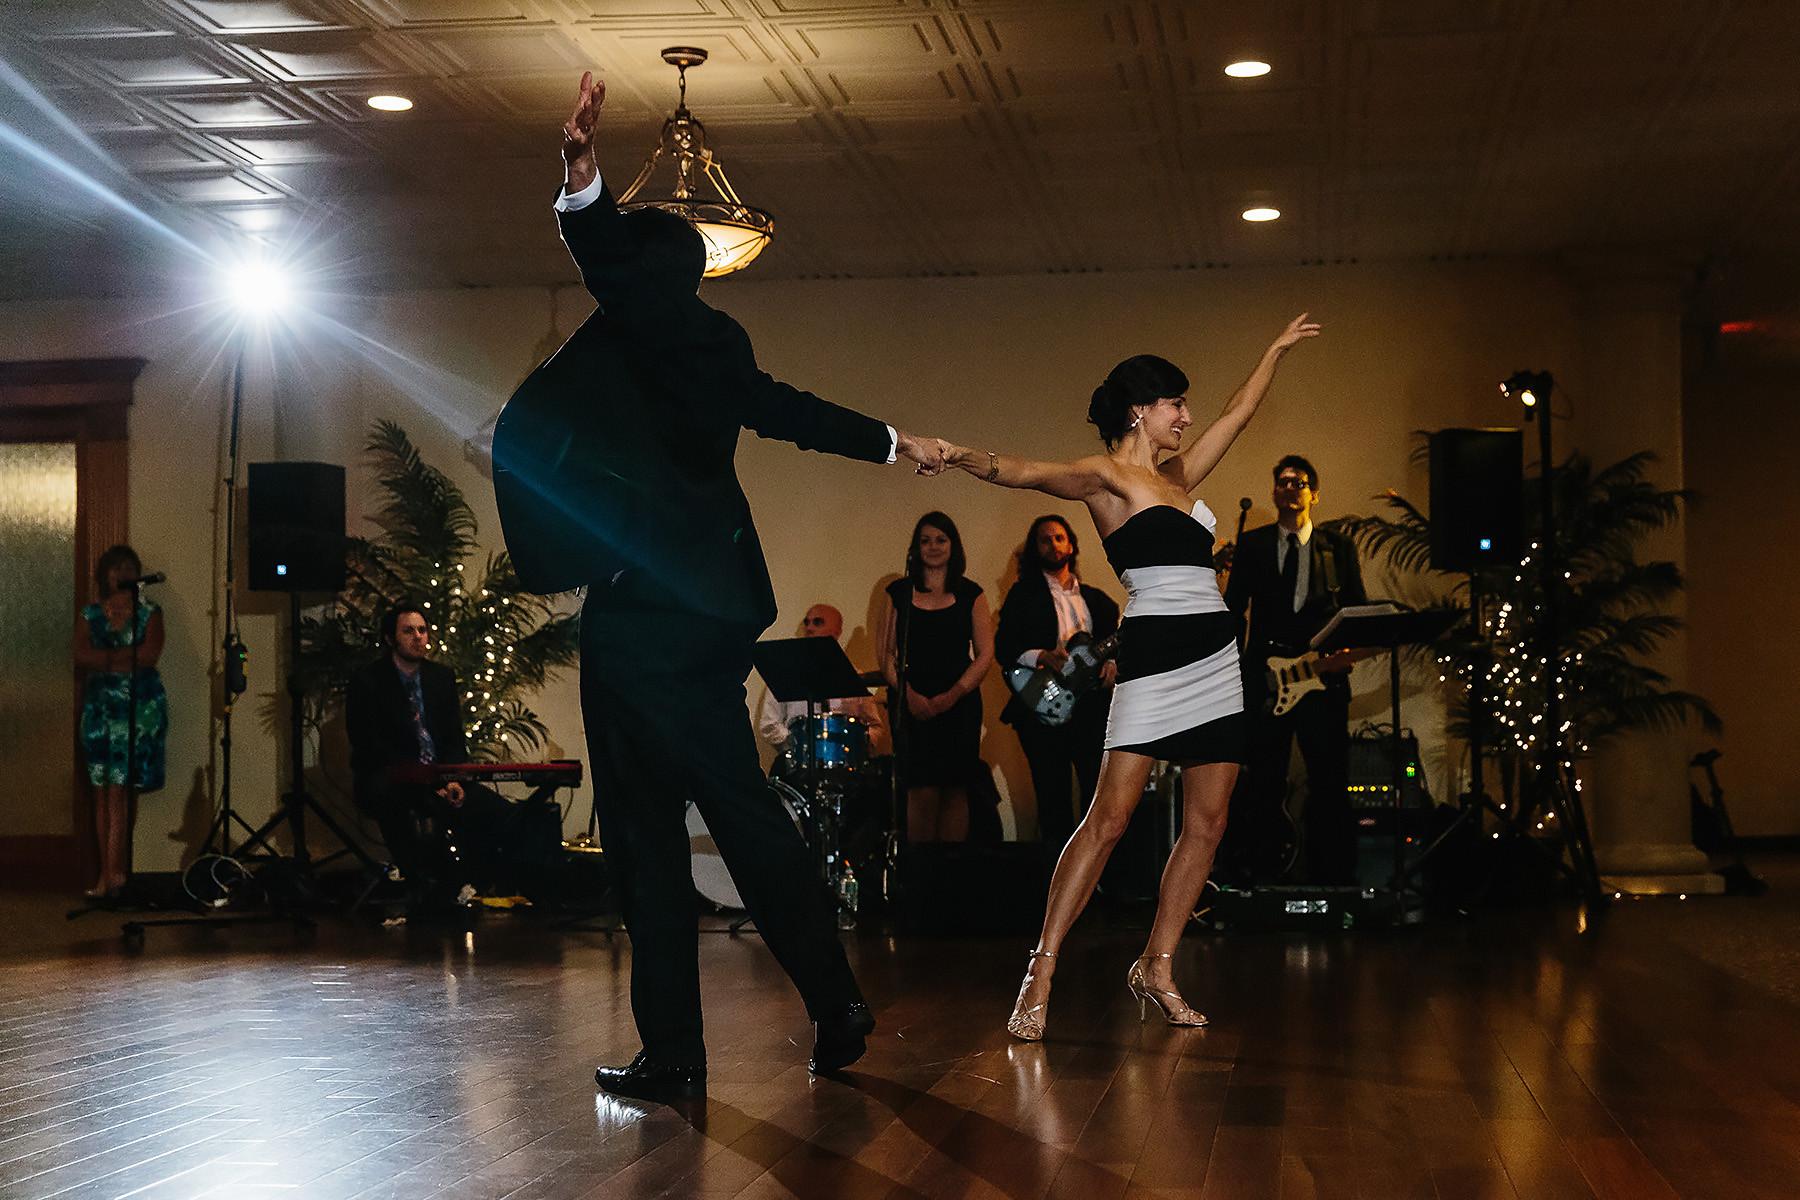 Bride & Groom First Swing Dance